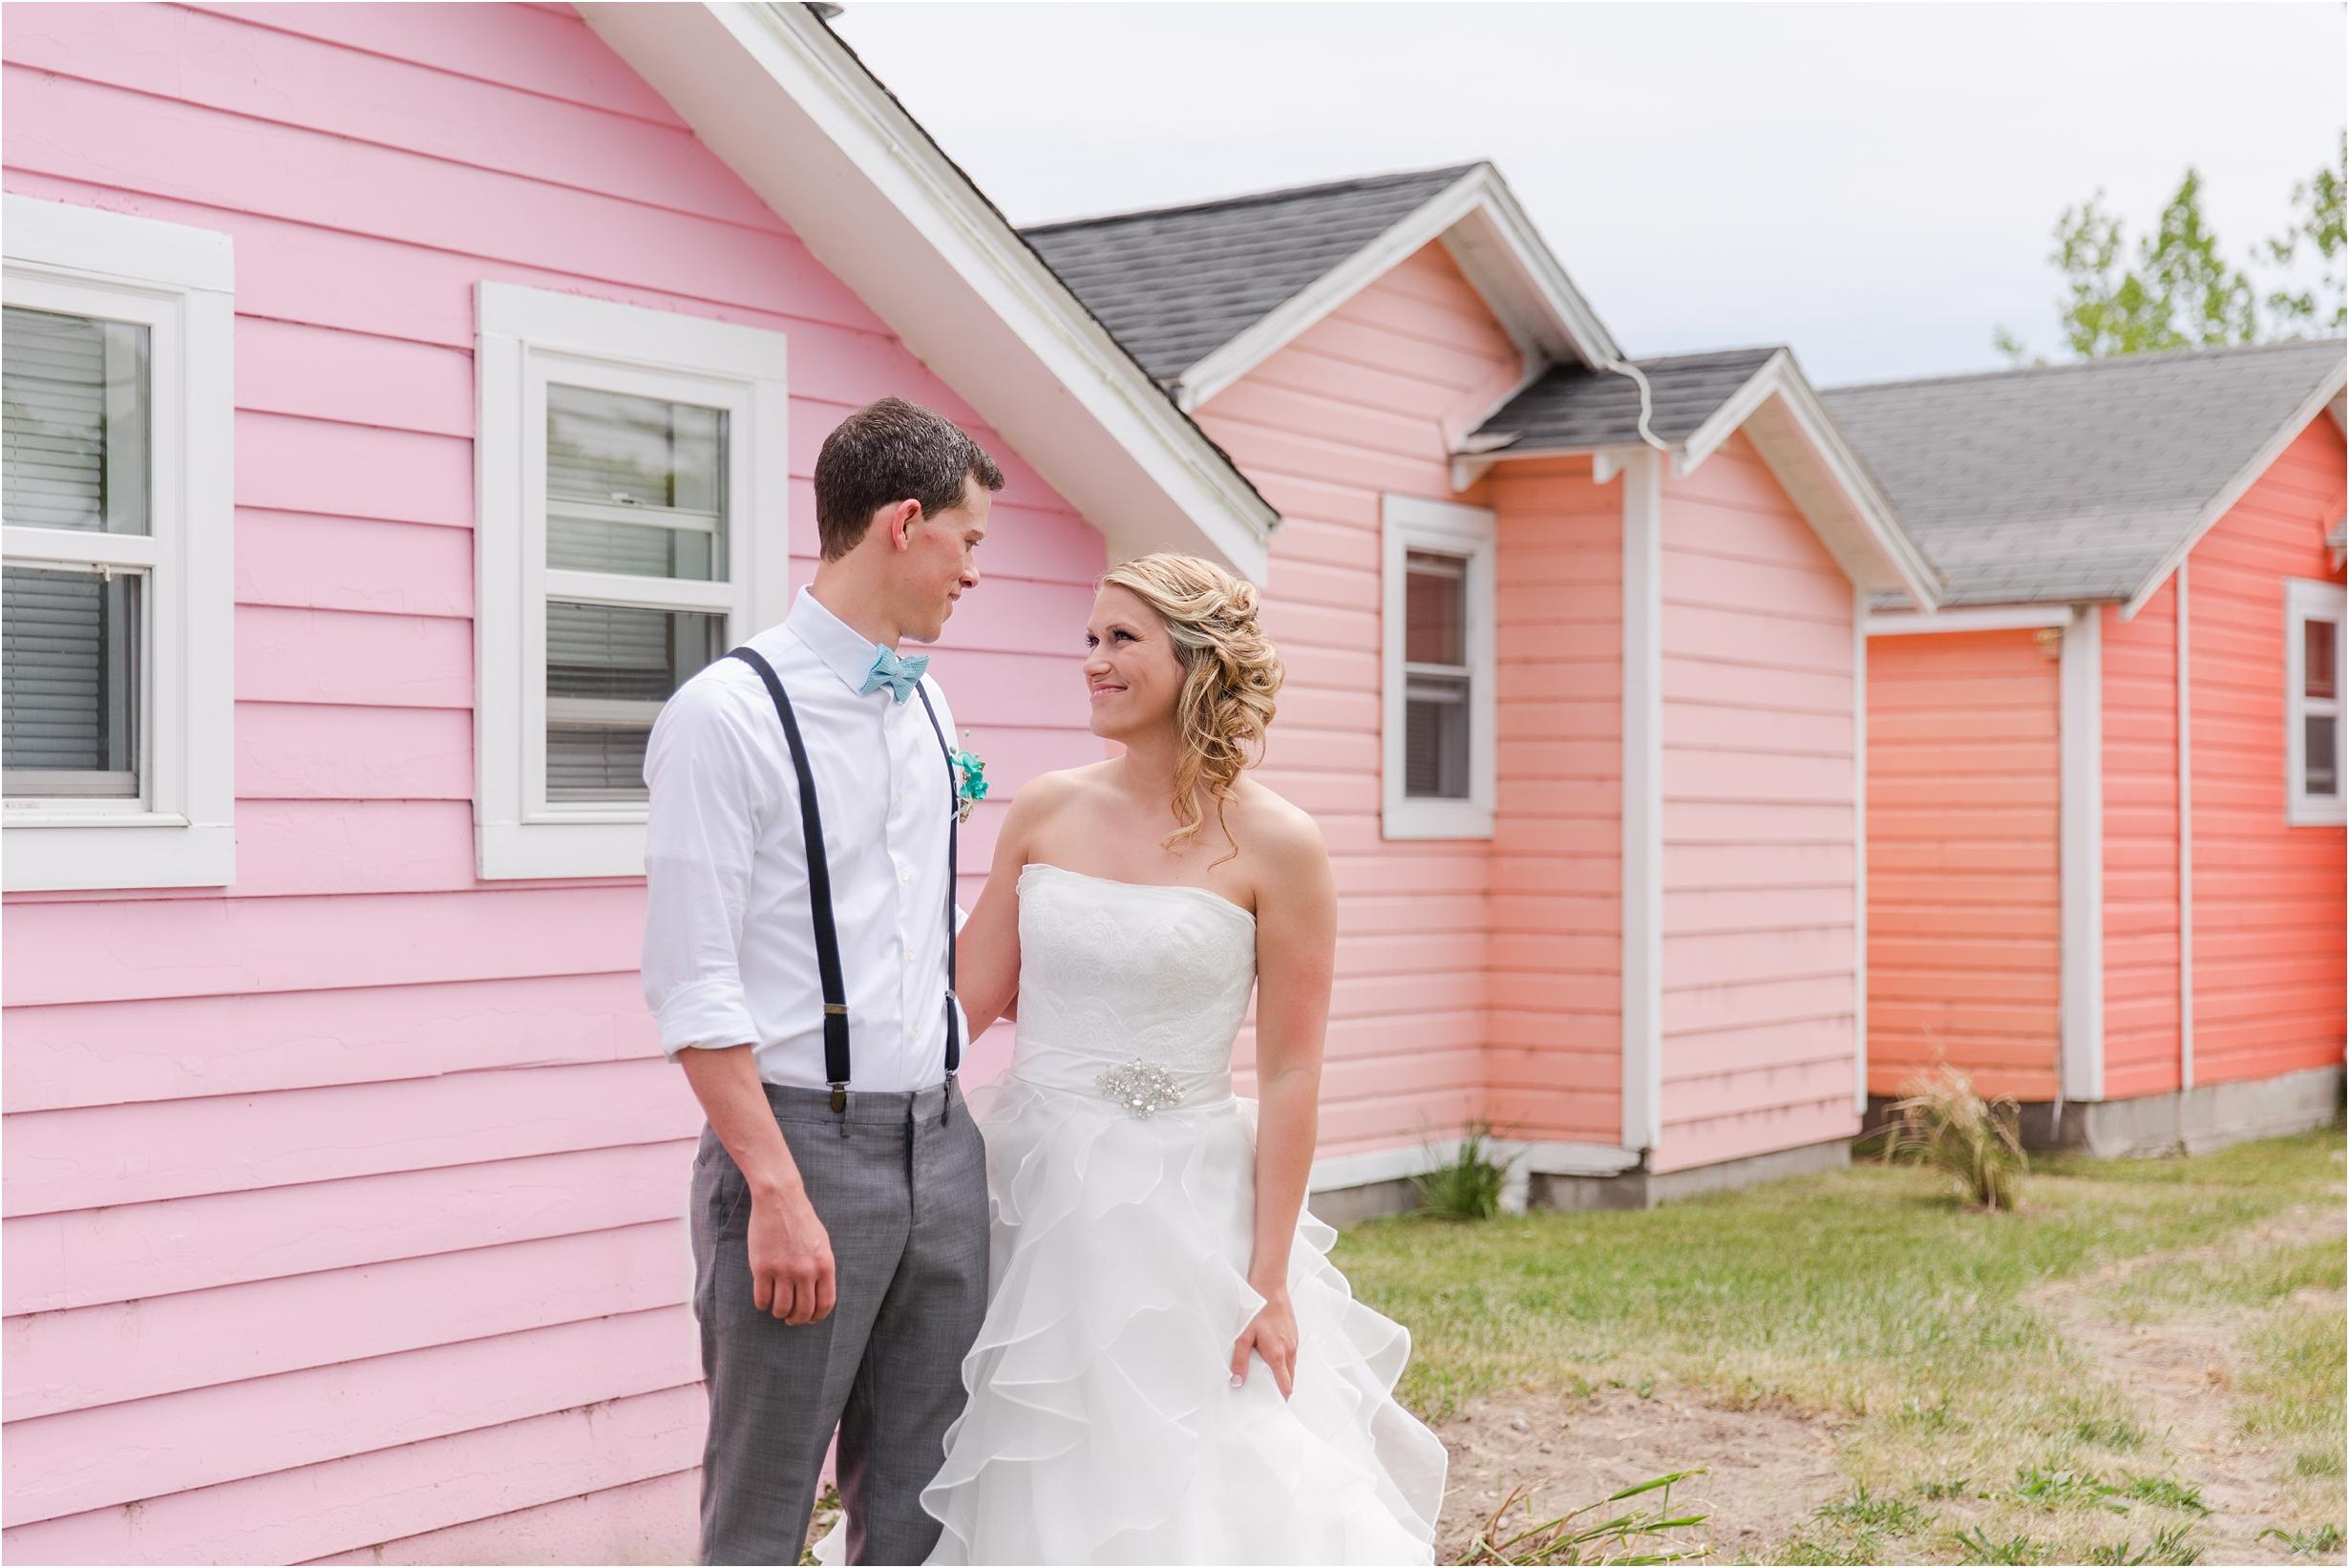 romantic-timeless-candid-wedding-photos-at-the-mai-tiki-resort-in-oscoda-mi-by-courtney-carolyn-photography_0005.jpg